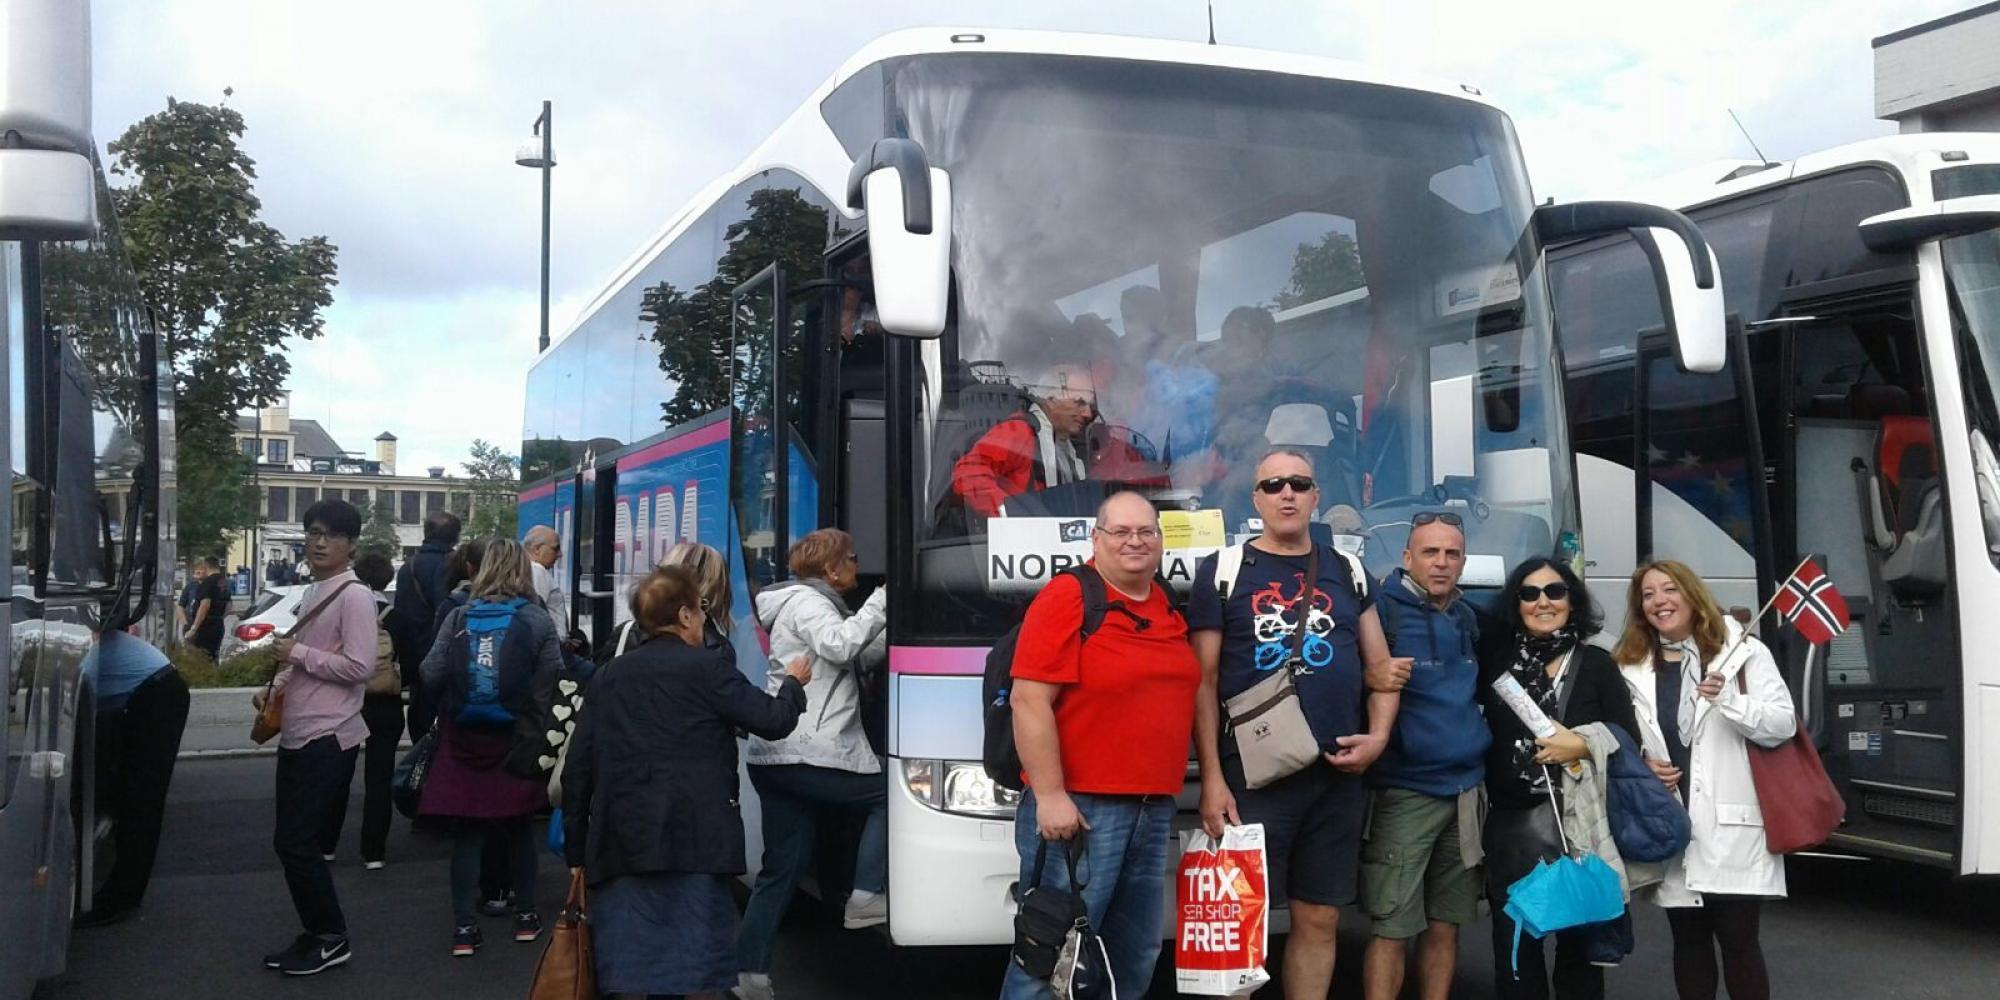 tour Norvegia caldana